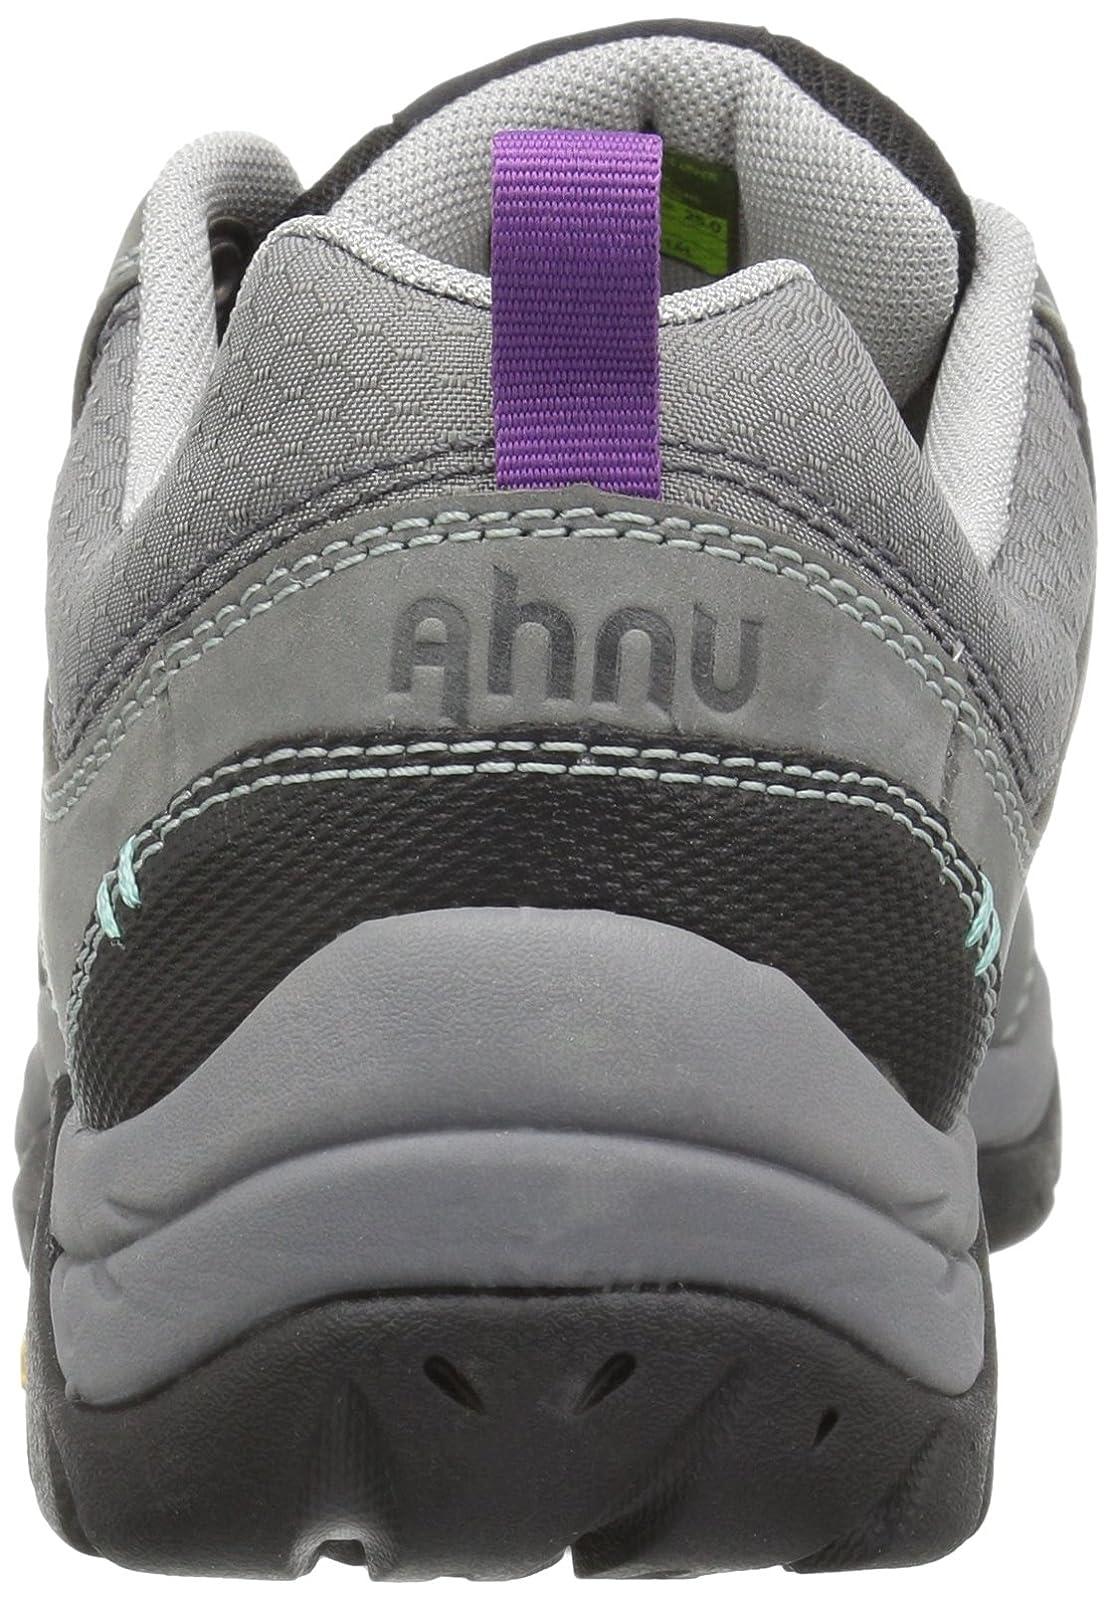 Ahnu Women's Montara II Hiking Shoe Black 6 B(M) US - 2